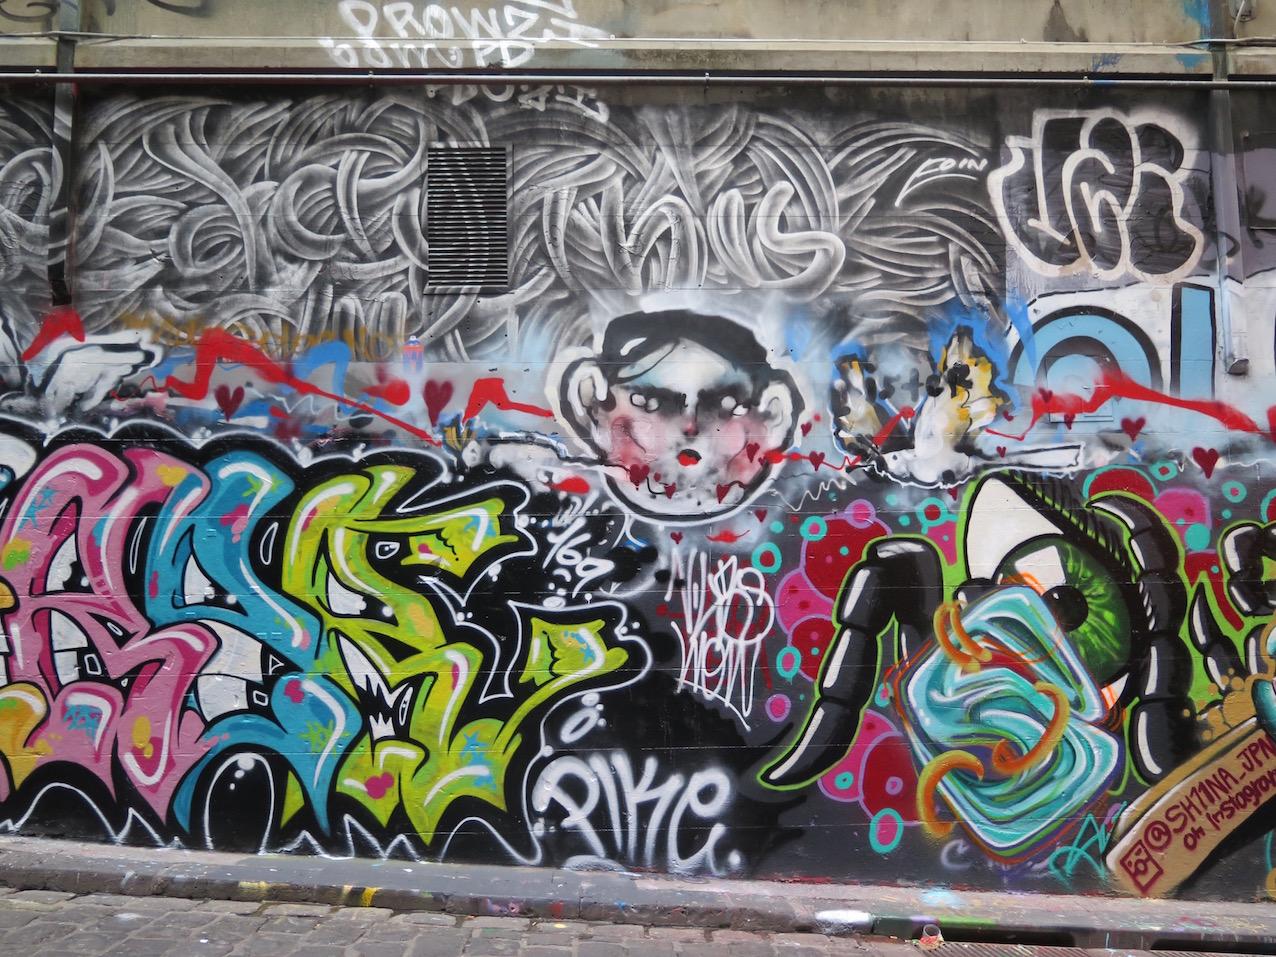 deansunshine_landofsunshine_melbourne_streetart_graffiti_lister does melb march 16 4